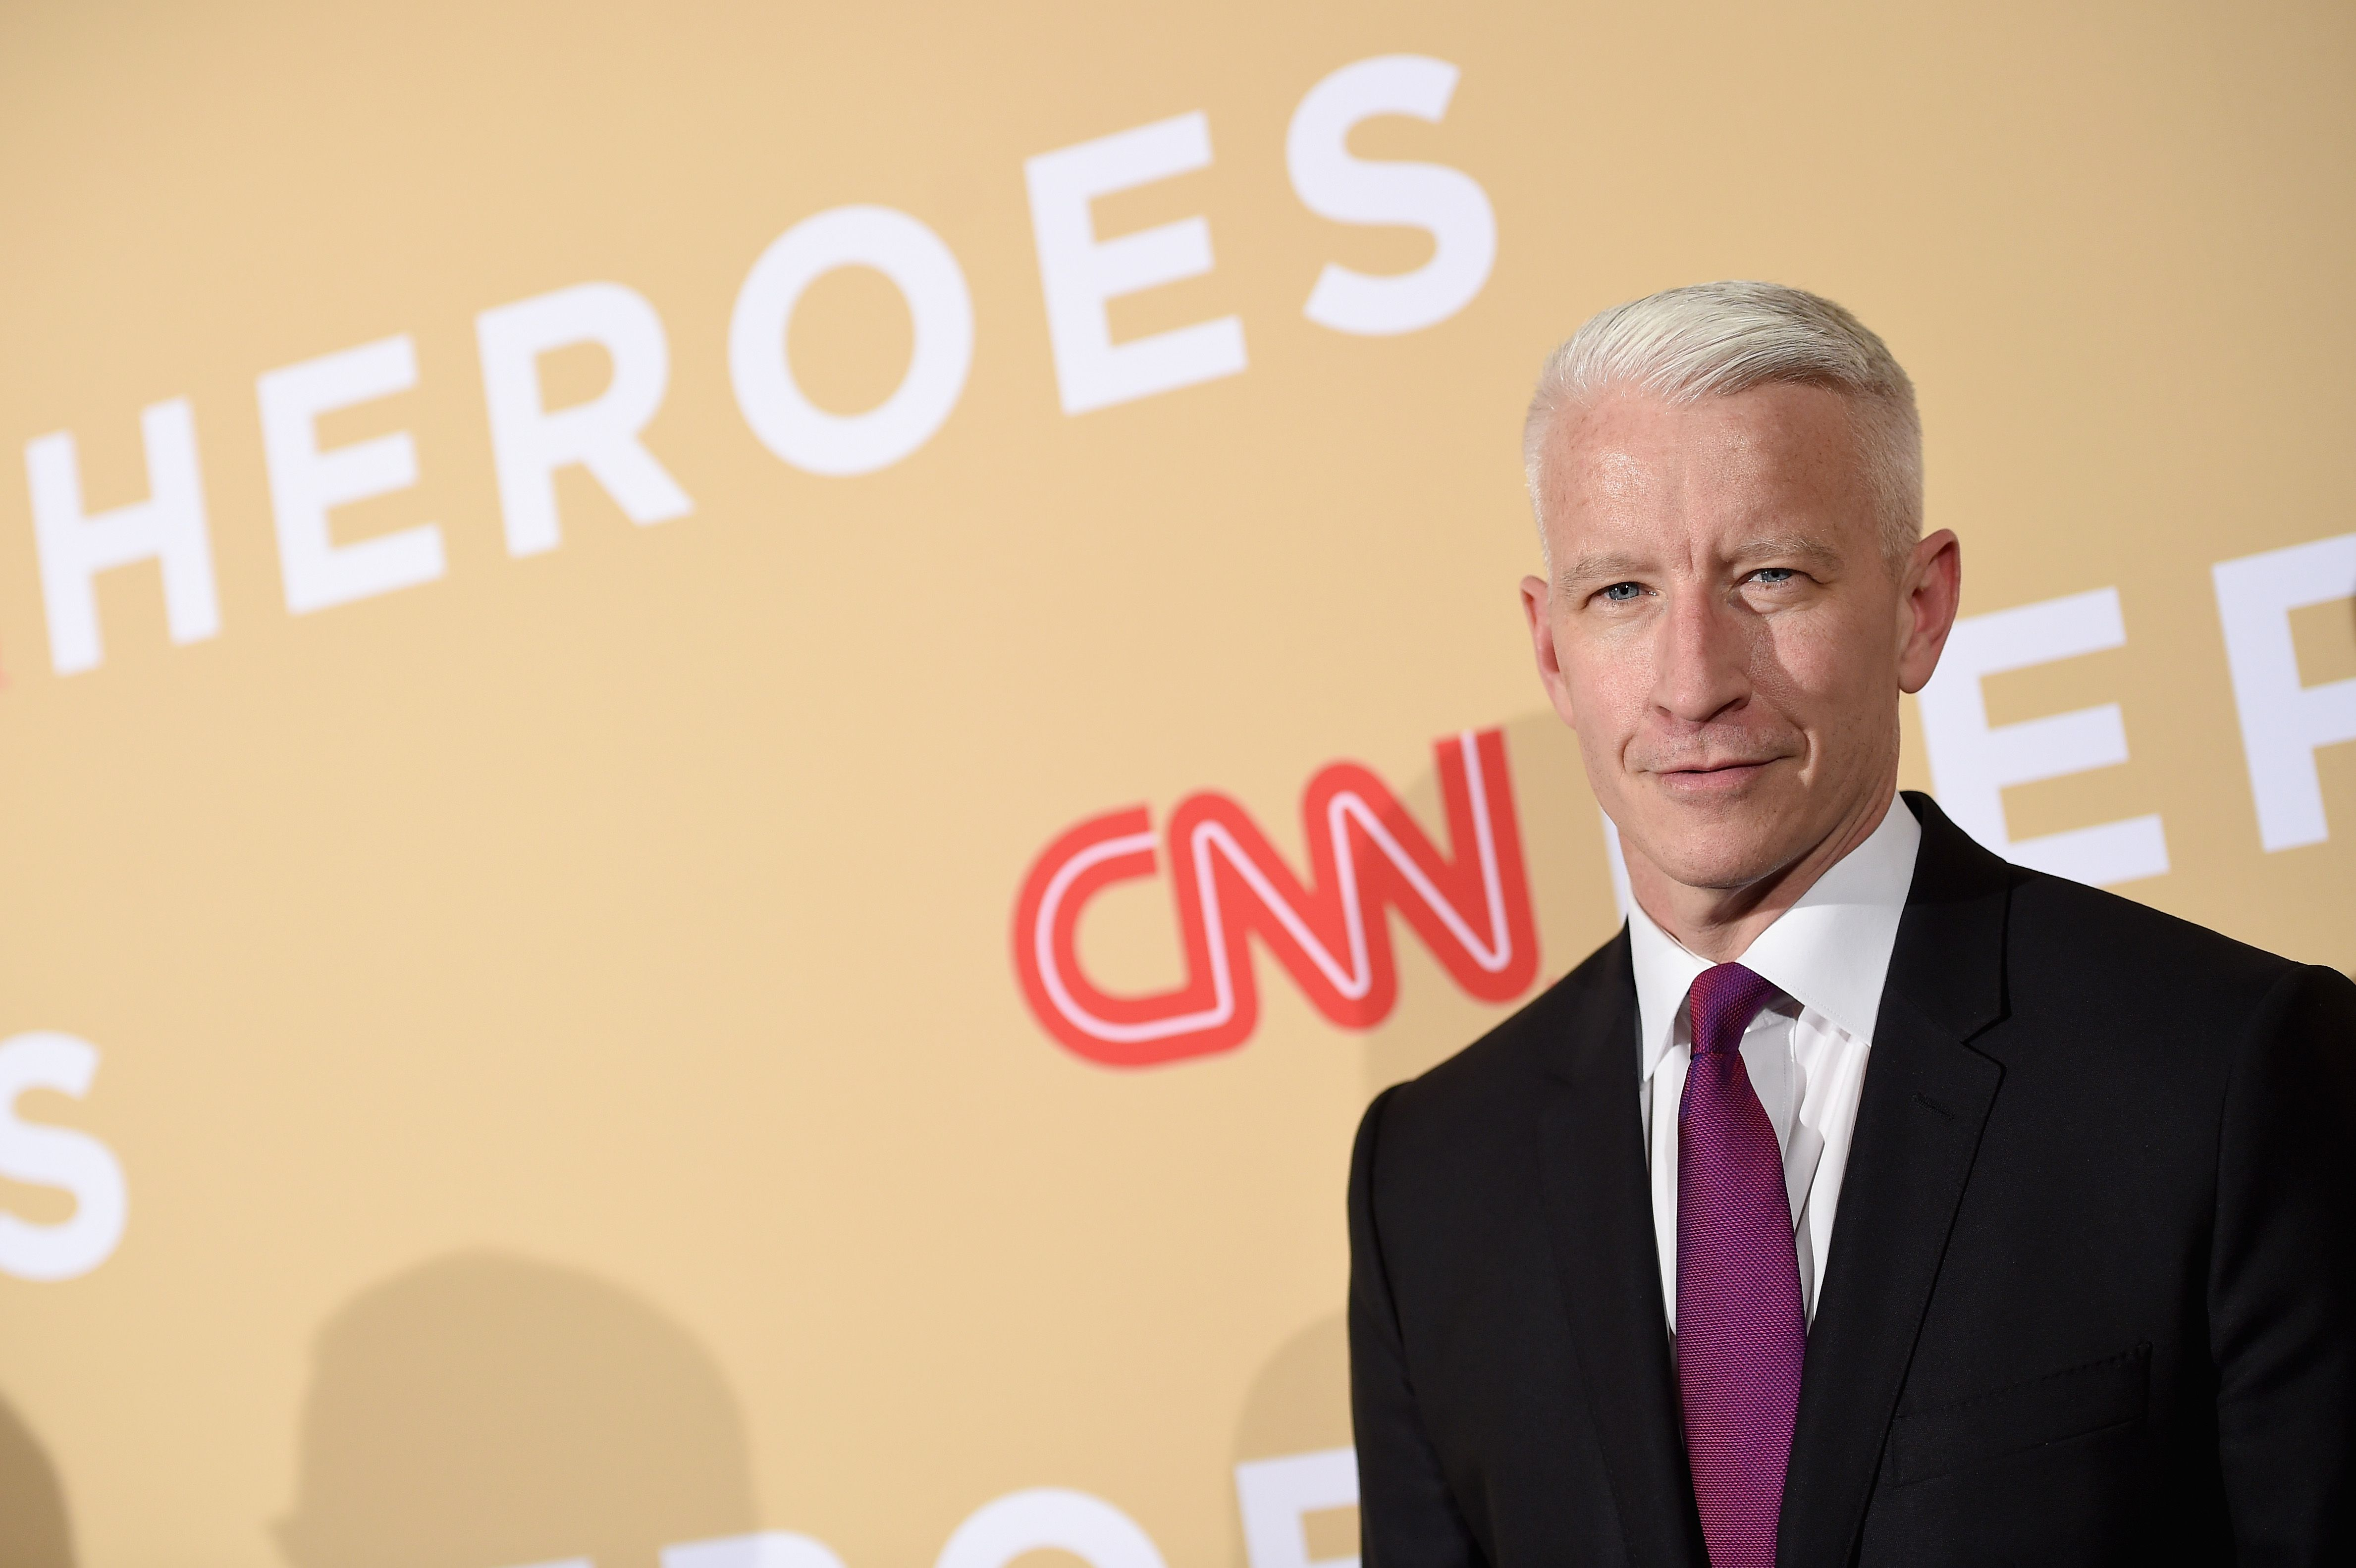 Anderson Cooper channel 1